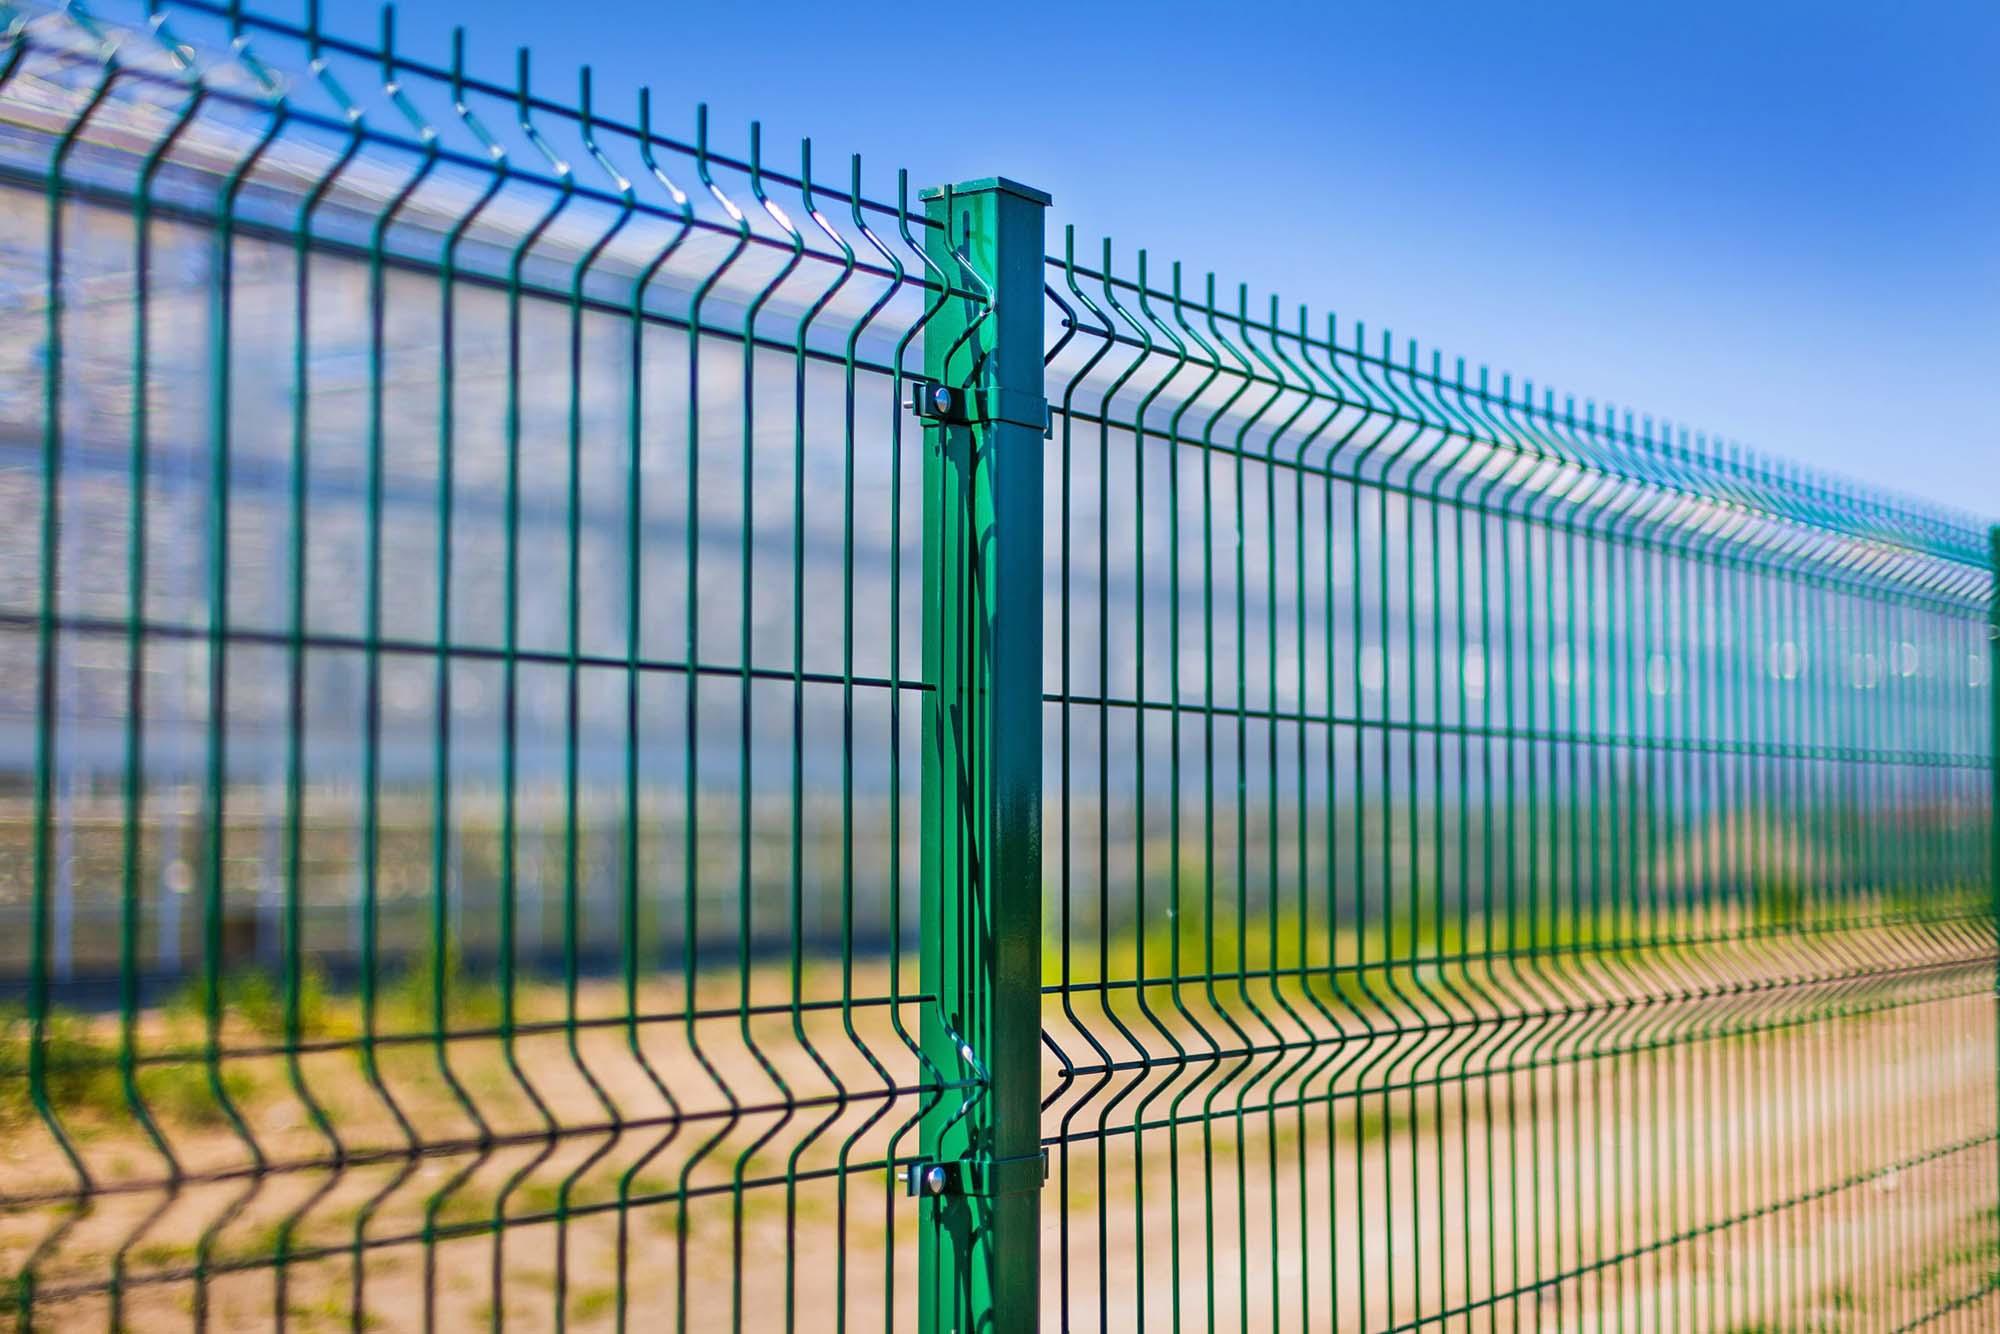 забор 3д в сочи